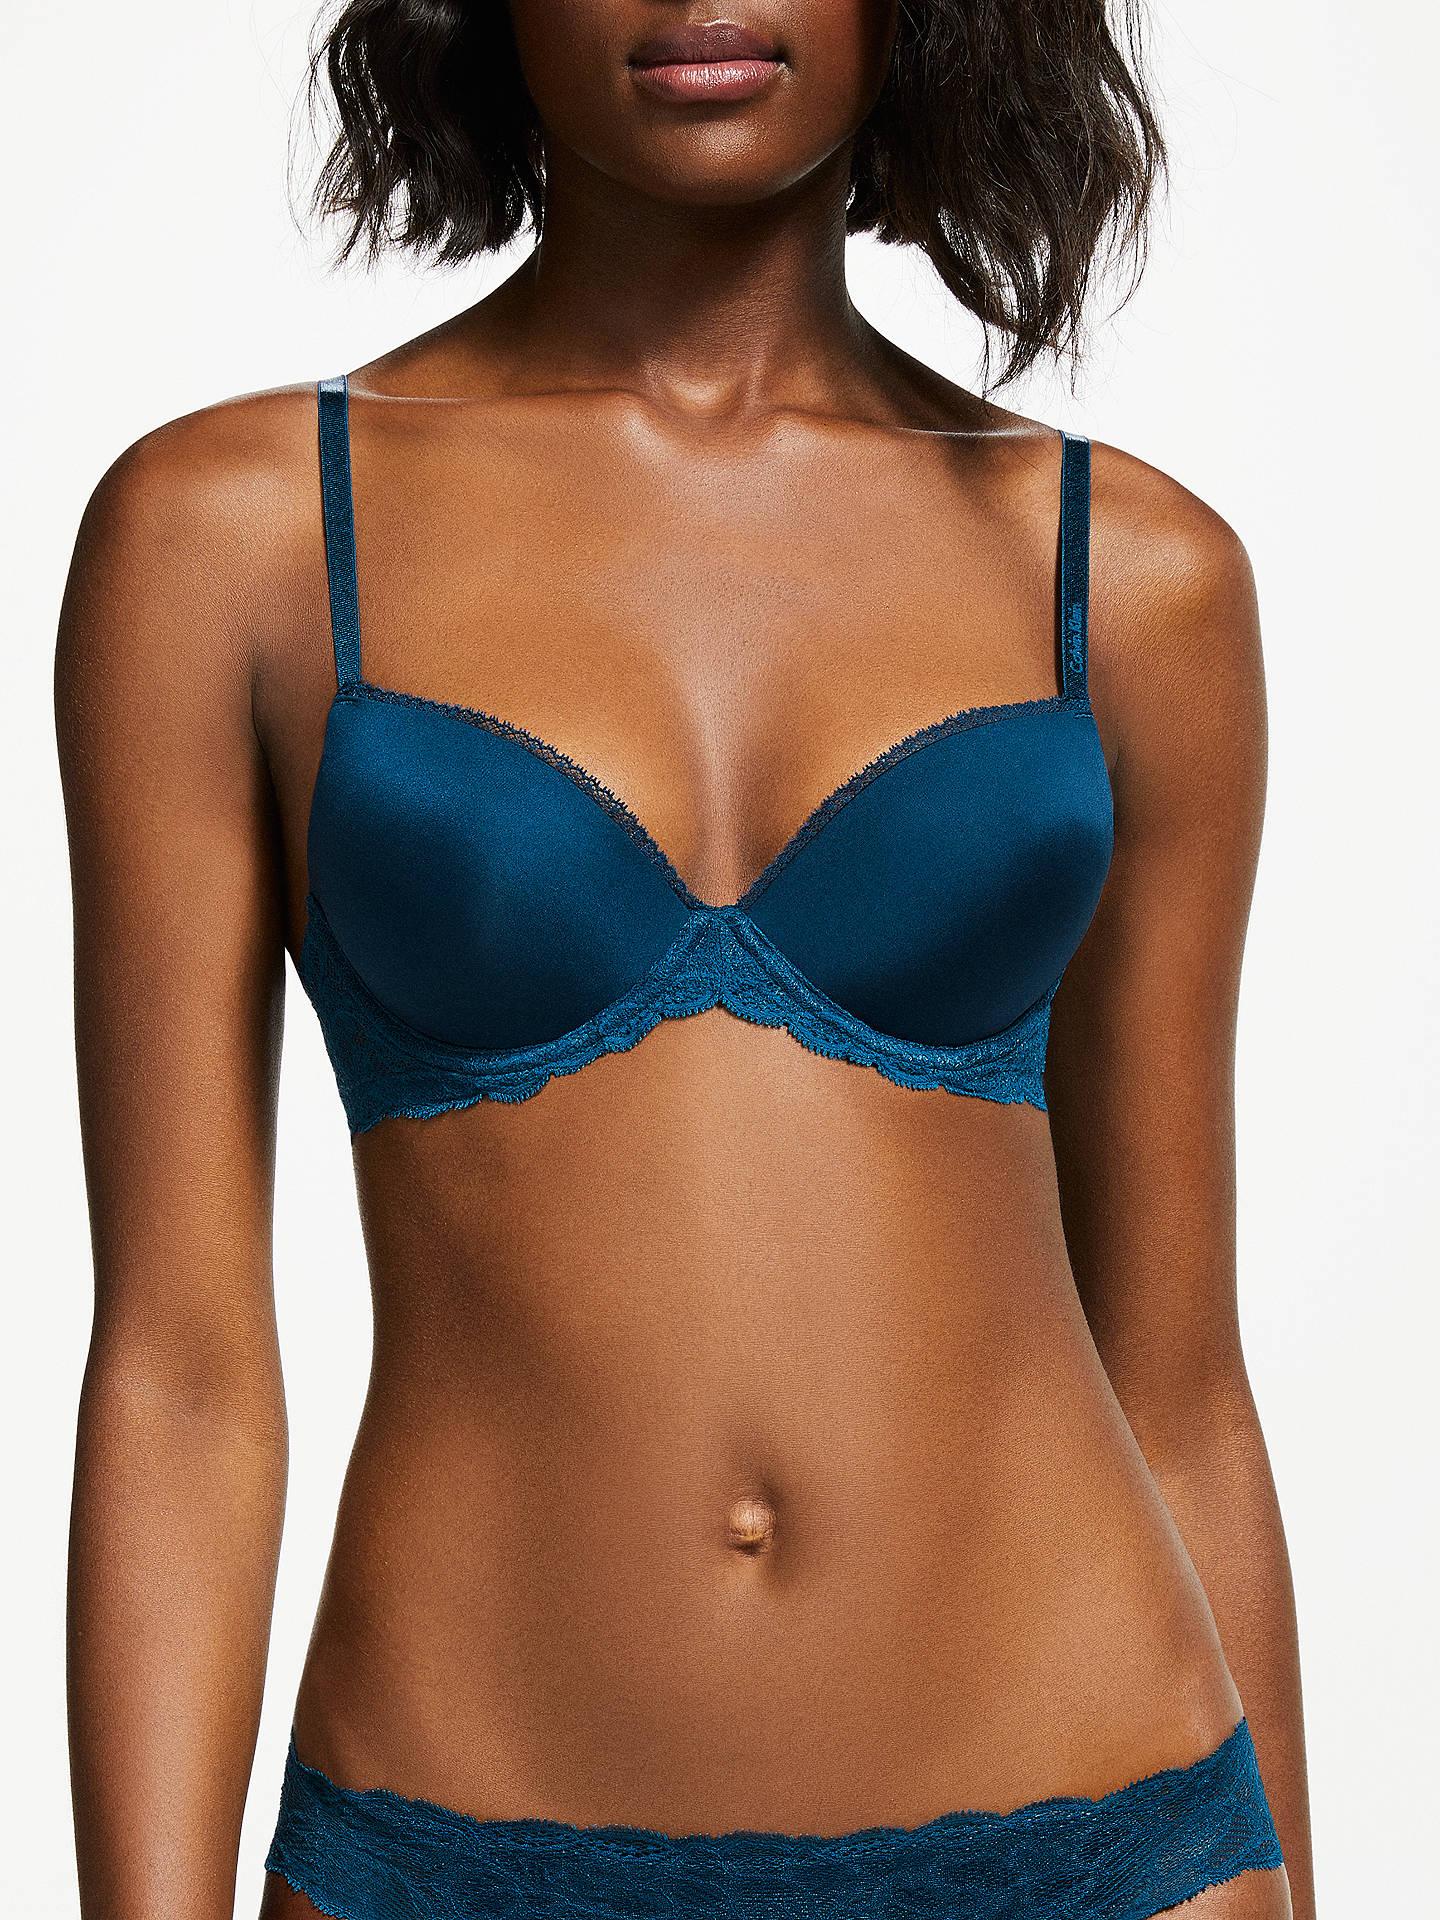 784175e77582d BuyCalvin Klein Underwear Seductive Comfort Demi Lift Bra